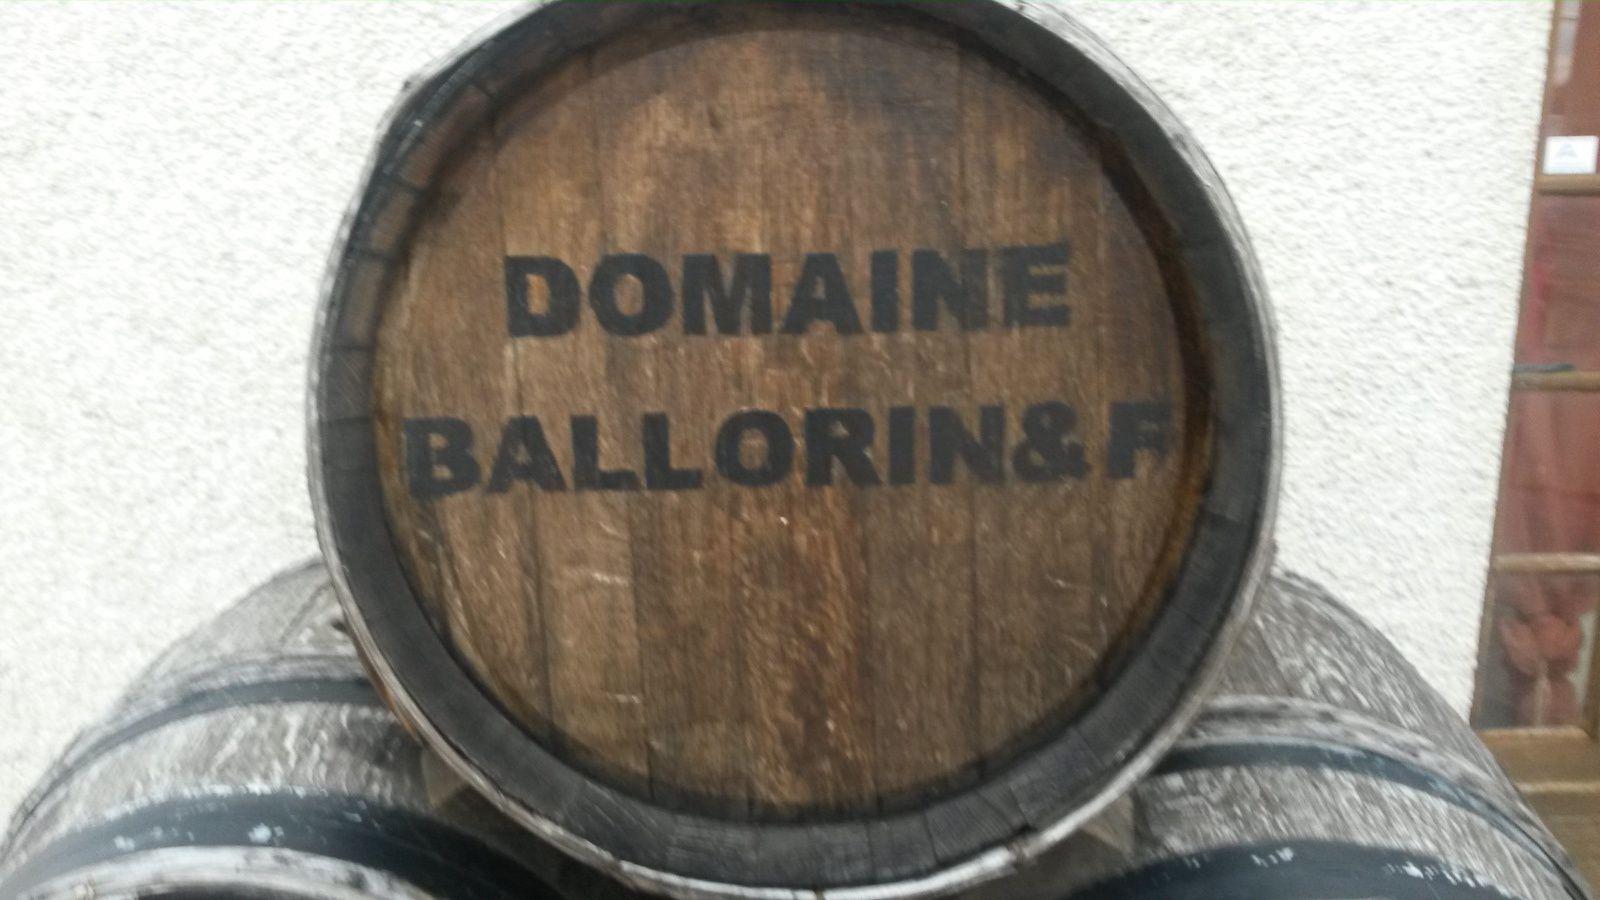 DOMAINE BALLORIN, MOREY SAINT DENIS